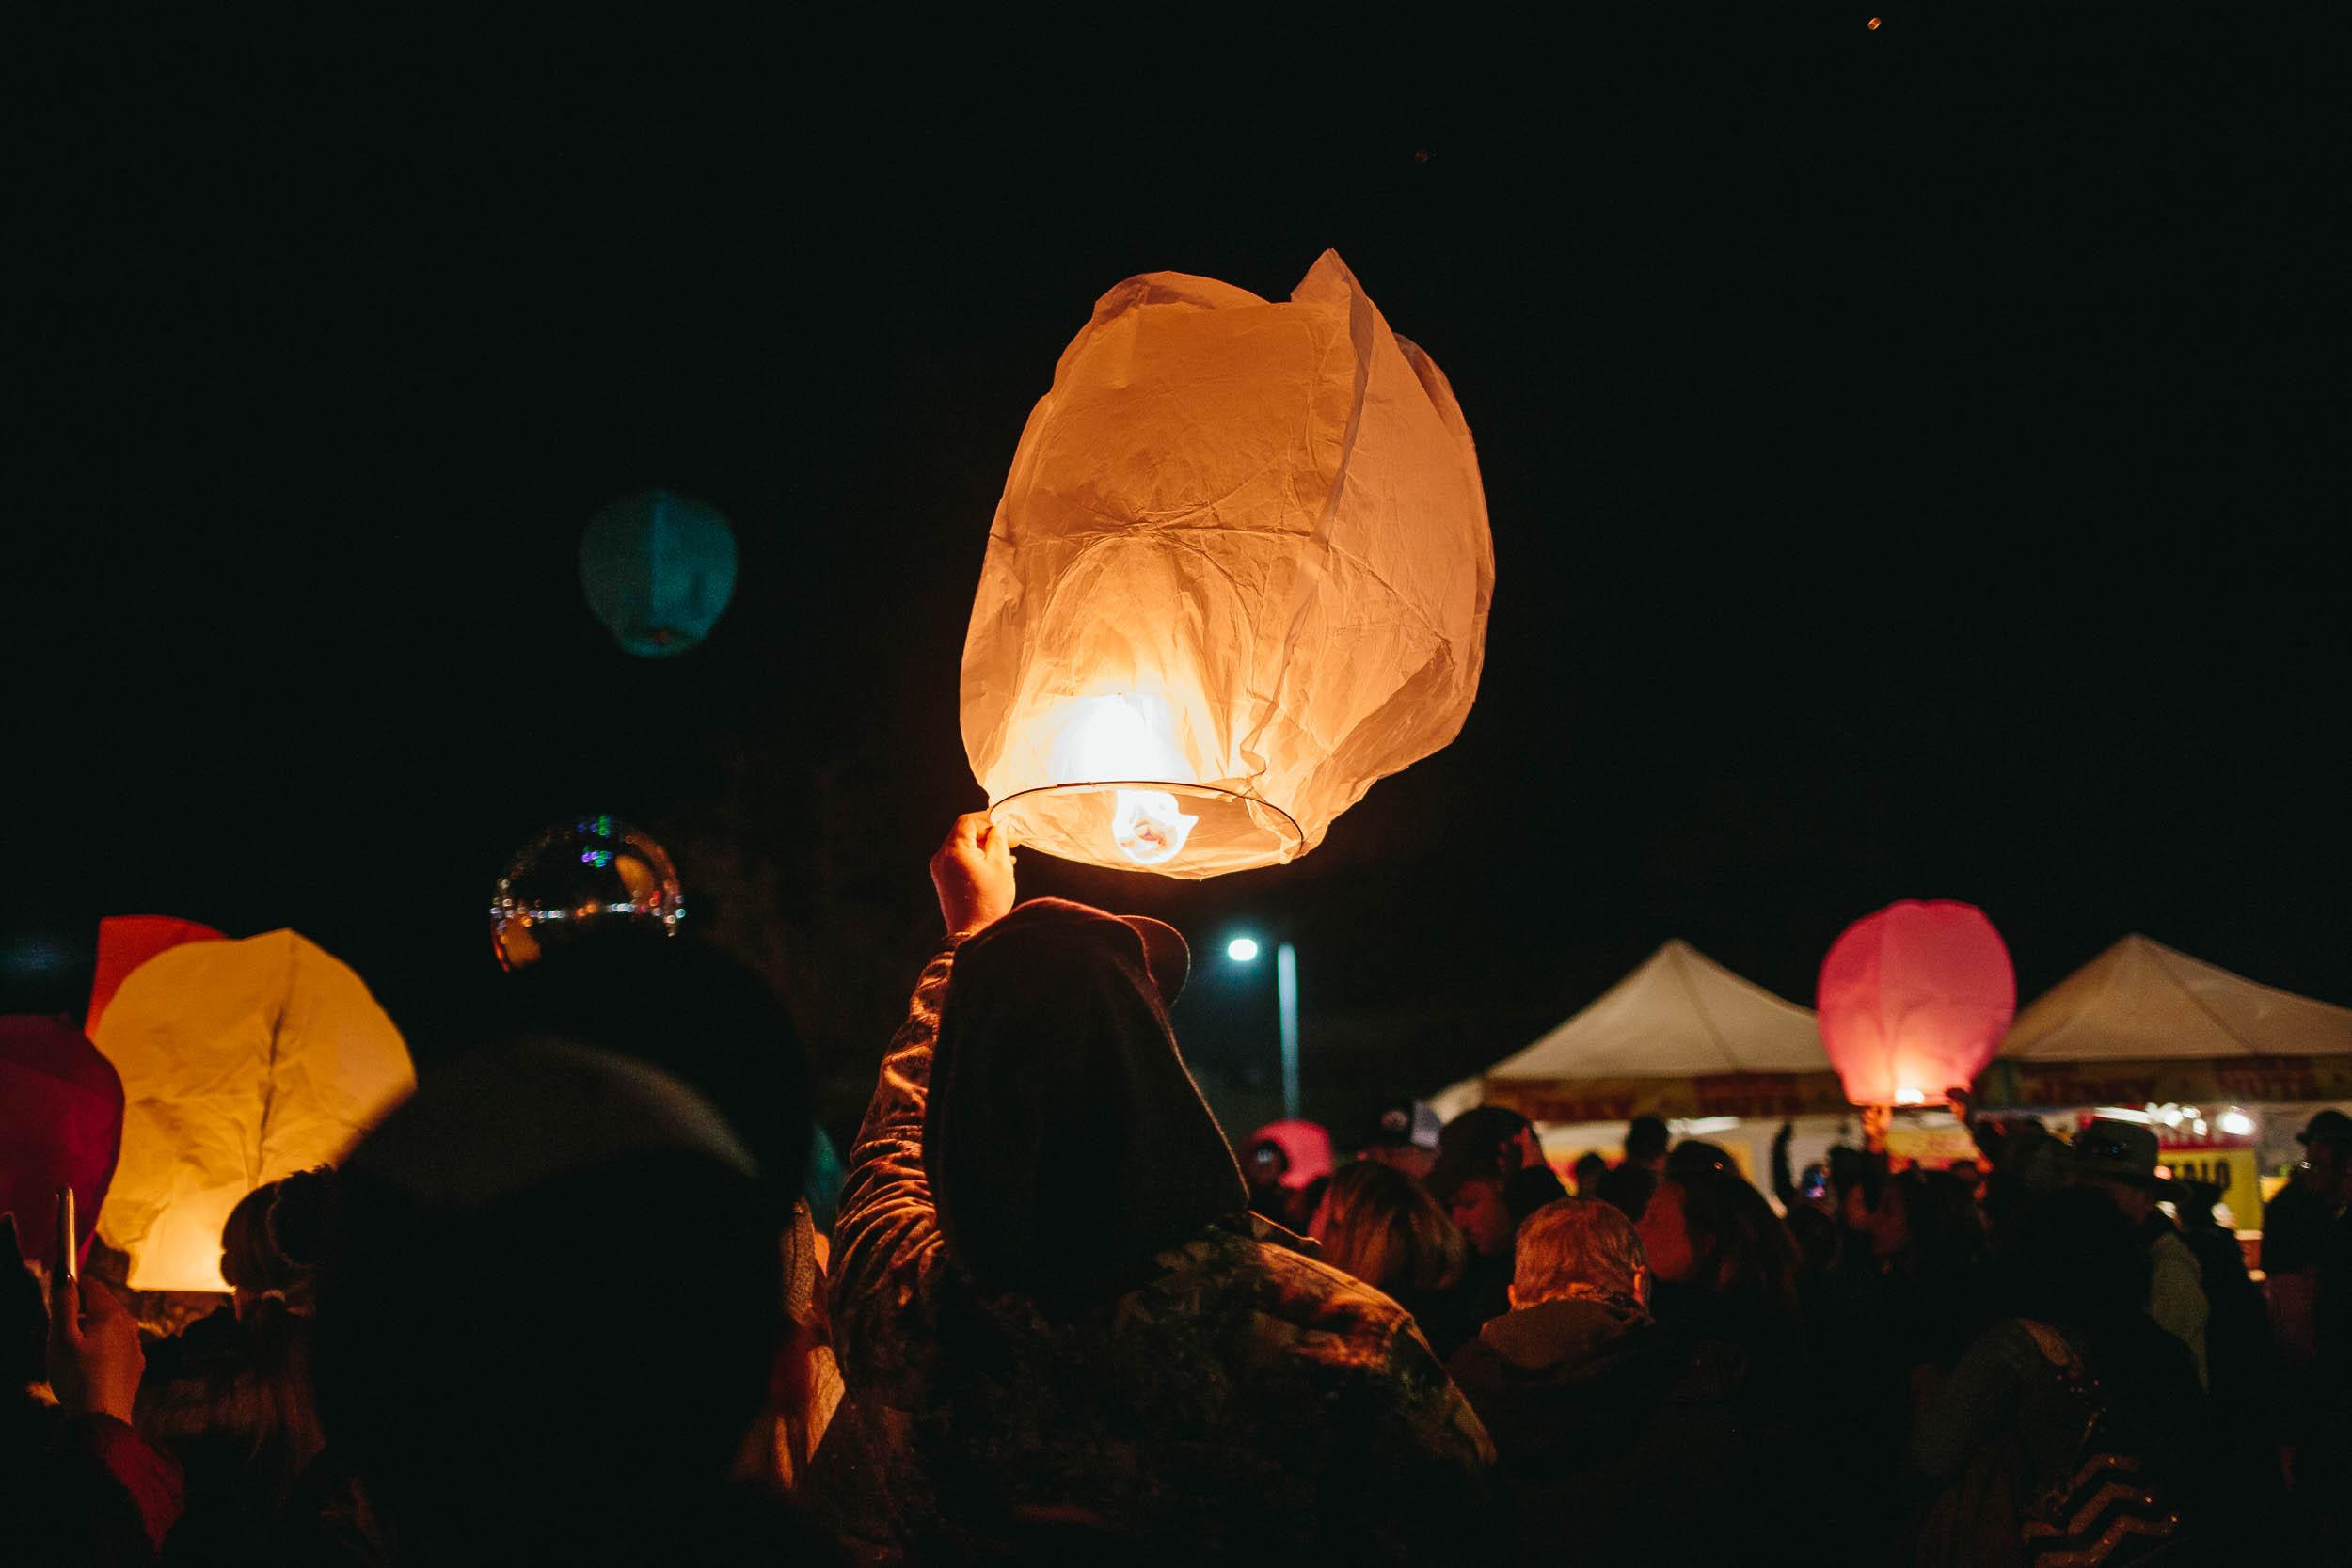 Kyle-Sheppard-Kanab-Balloon-Festival-59.jpg